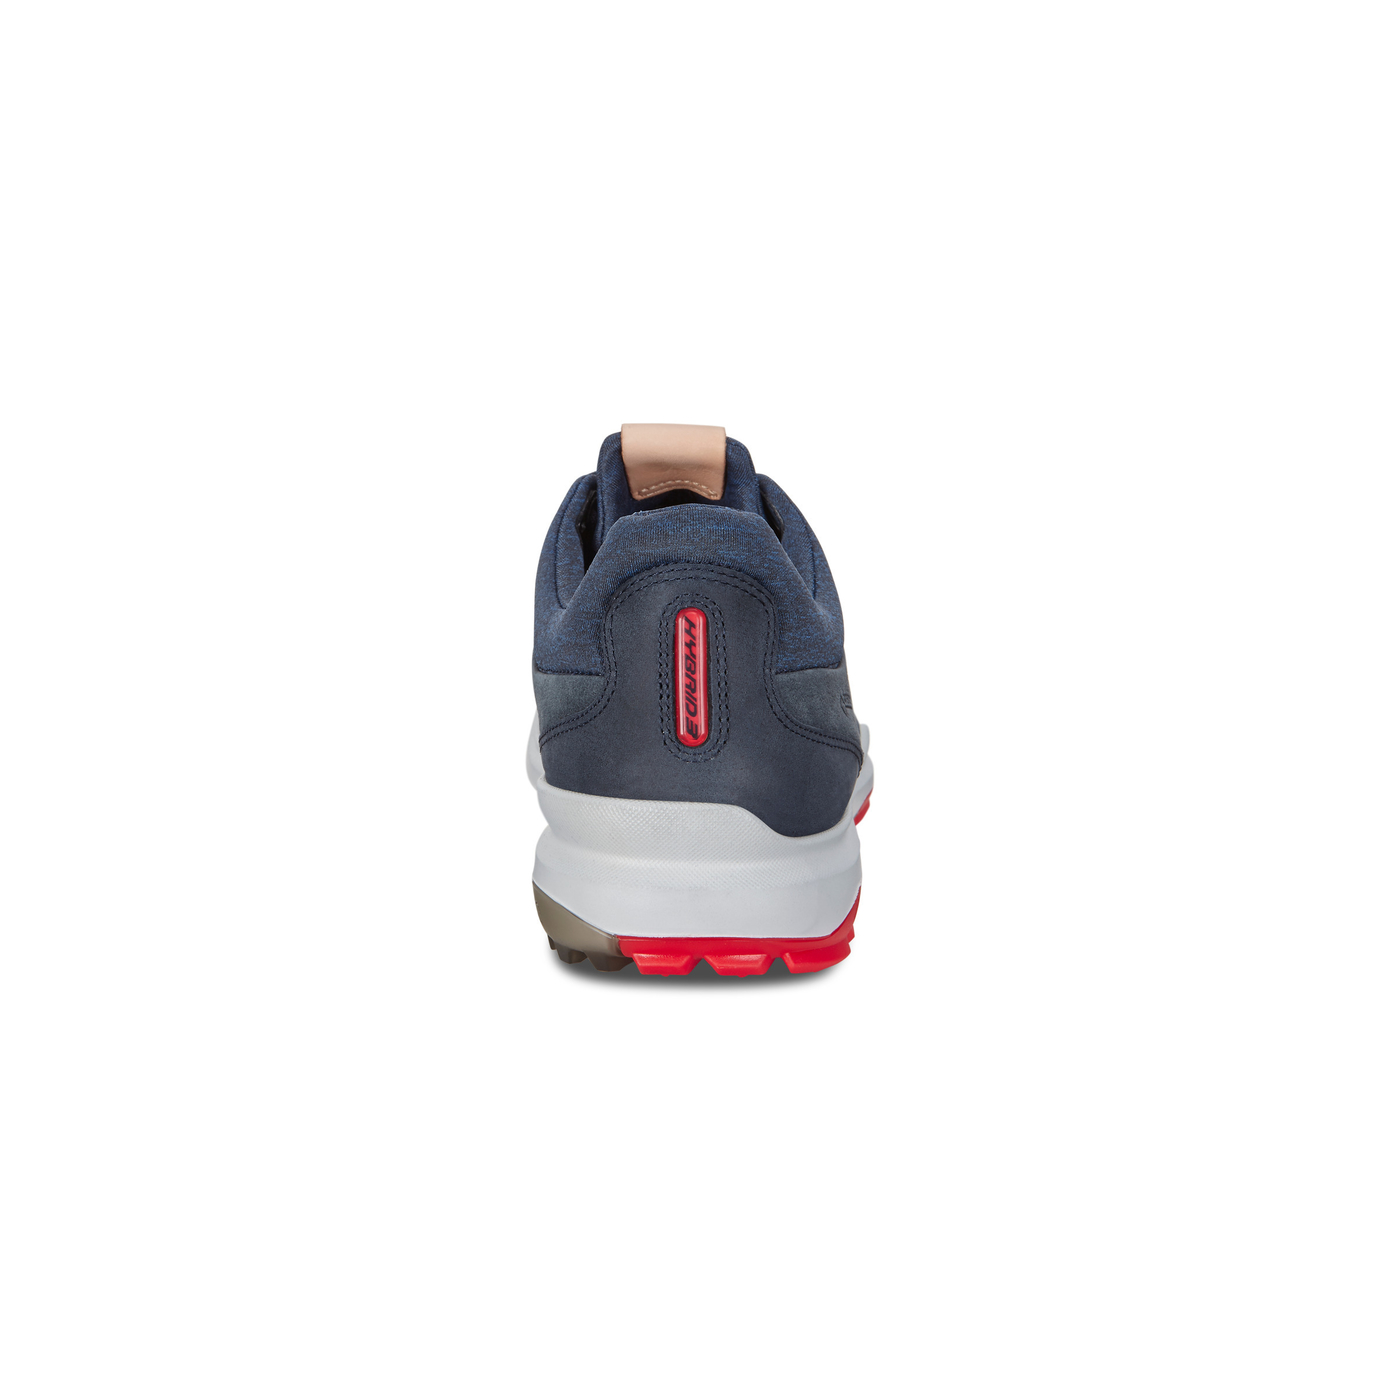 405631a275d242 ECCO Men's BIOM Hybrid 3 Gore-tex GOLF Shoes - O'Dwyers Golf Store